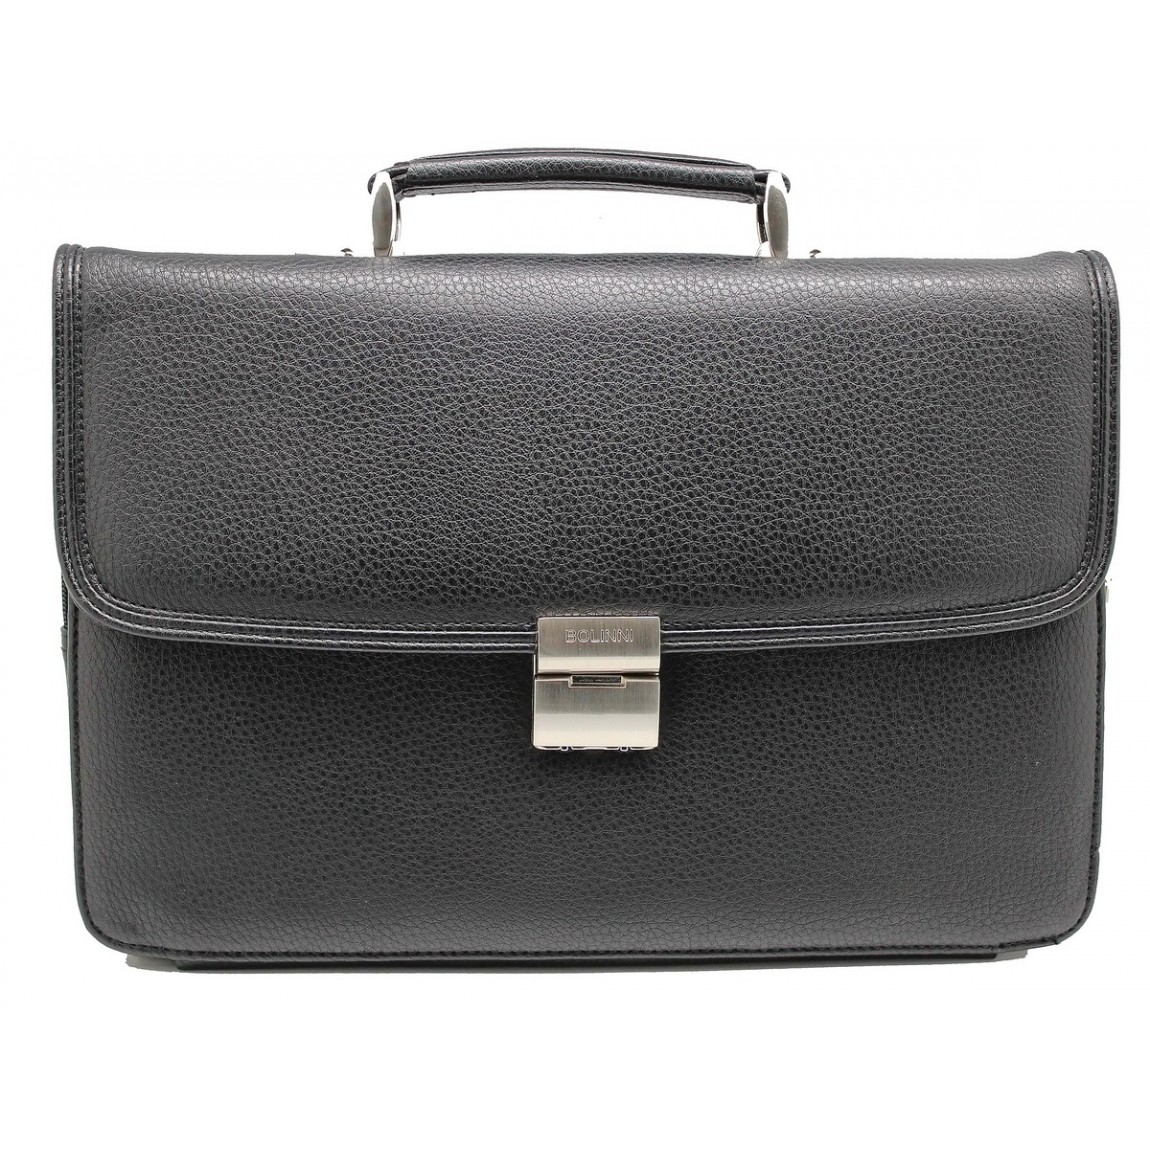 864b6c1f6c6d Bolinni барсетки, планшеты, сумки - для мужчин отличного качества